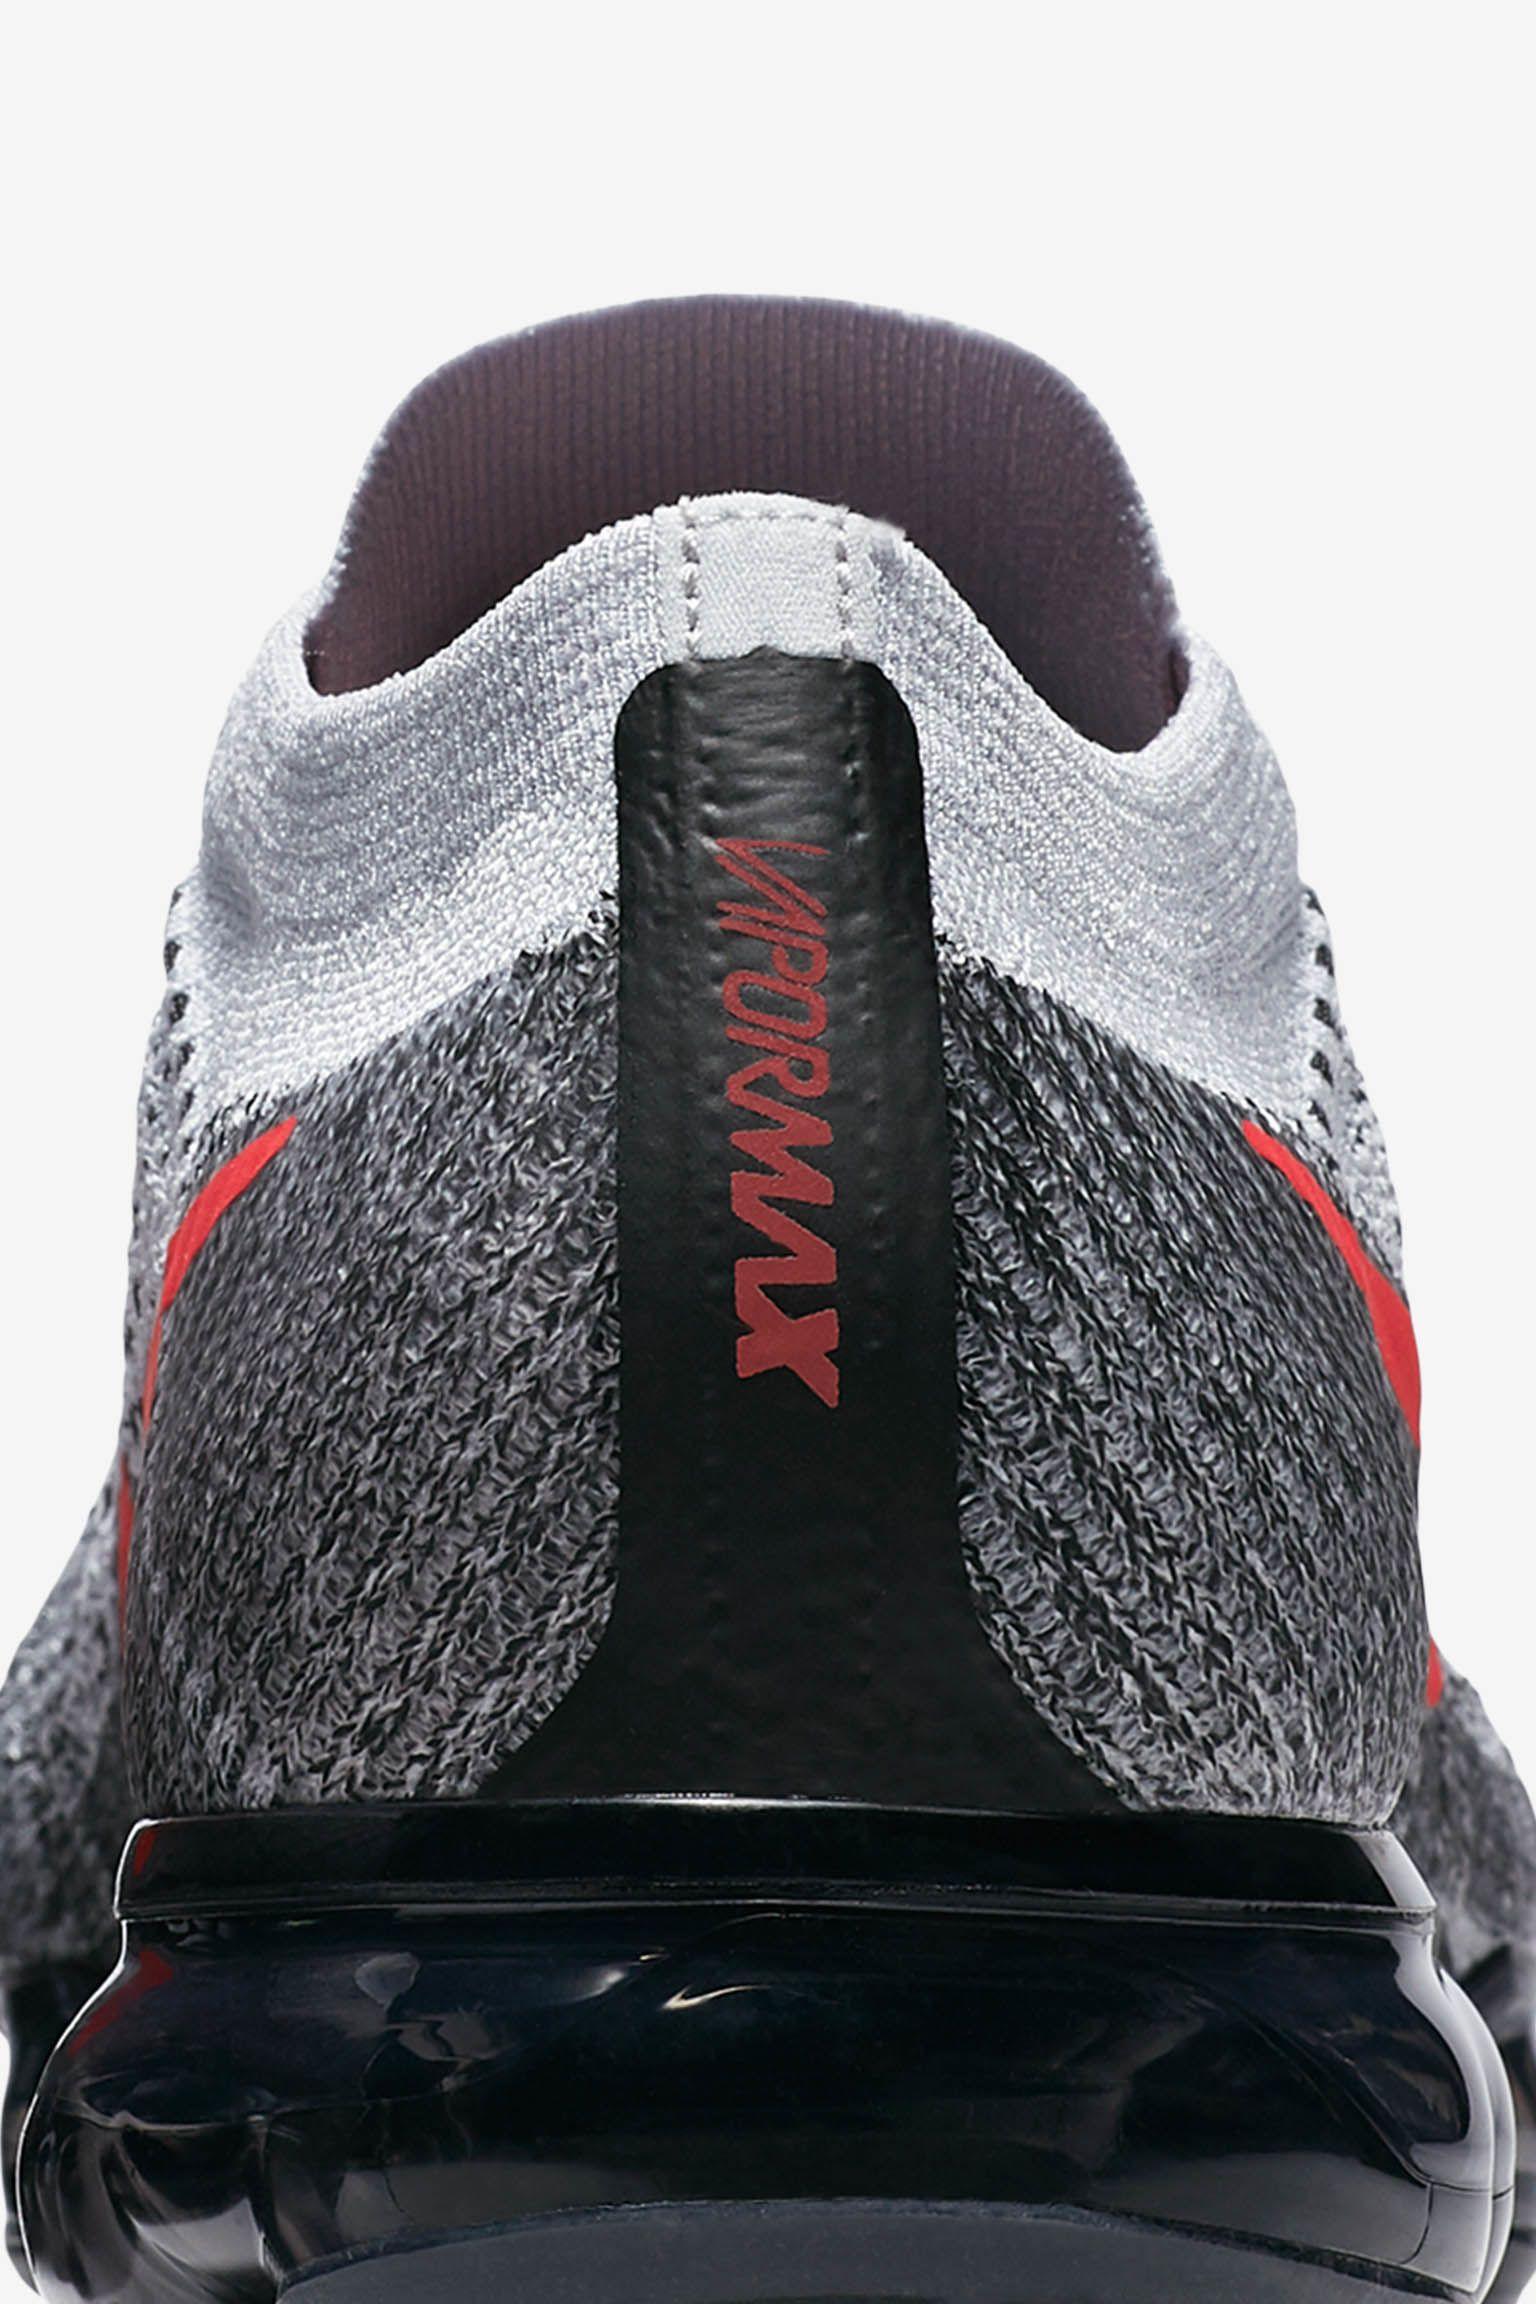 Nike Air Vapormax 1 OG 'Pure Platinum & University Red' Release Date